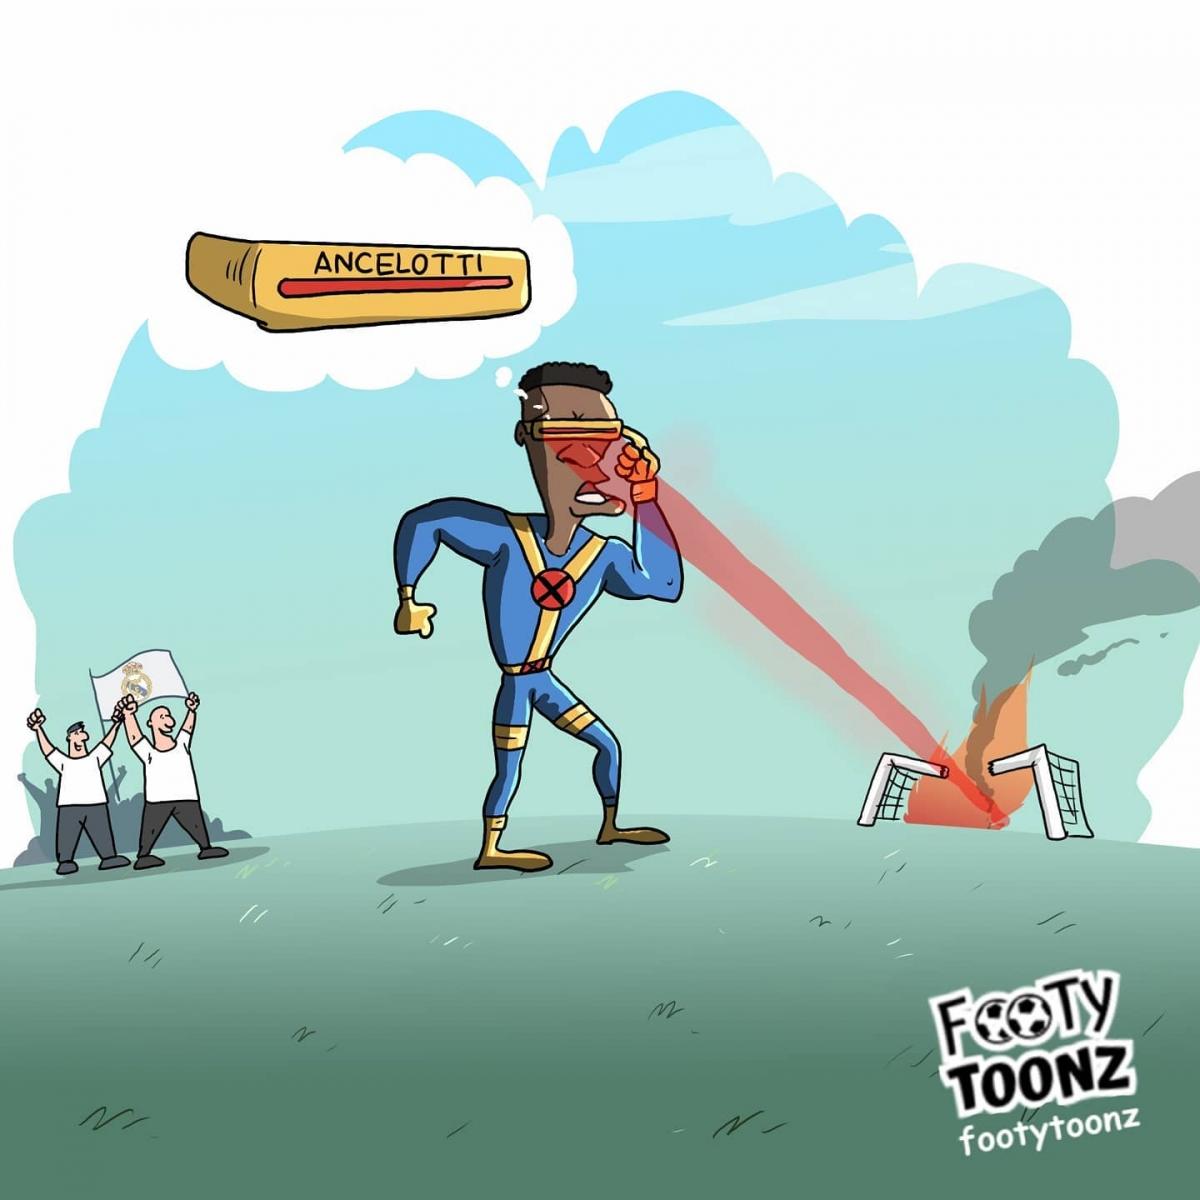 HLV Carlo Ancelotti nâng tầm Vinicius. (Ảnh: Footy Toonz)